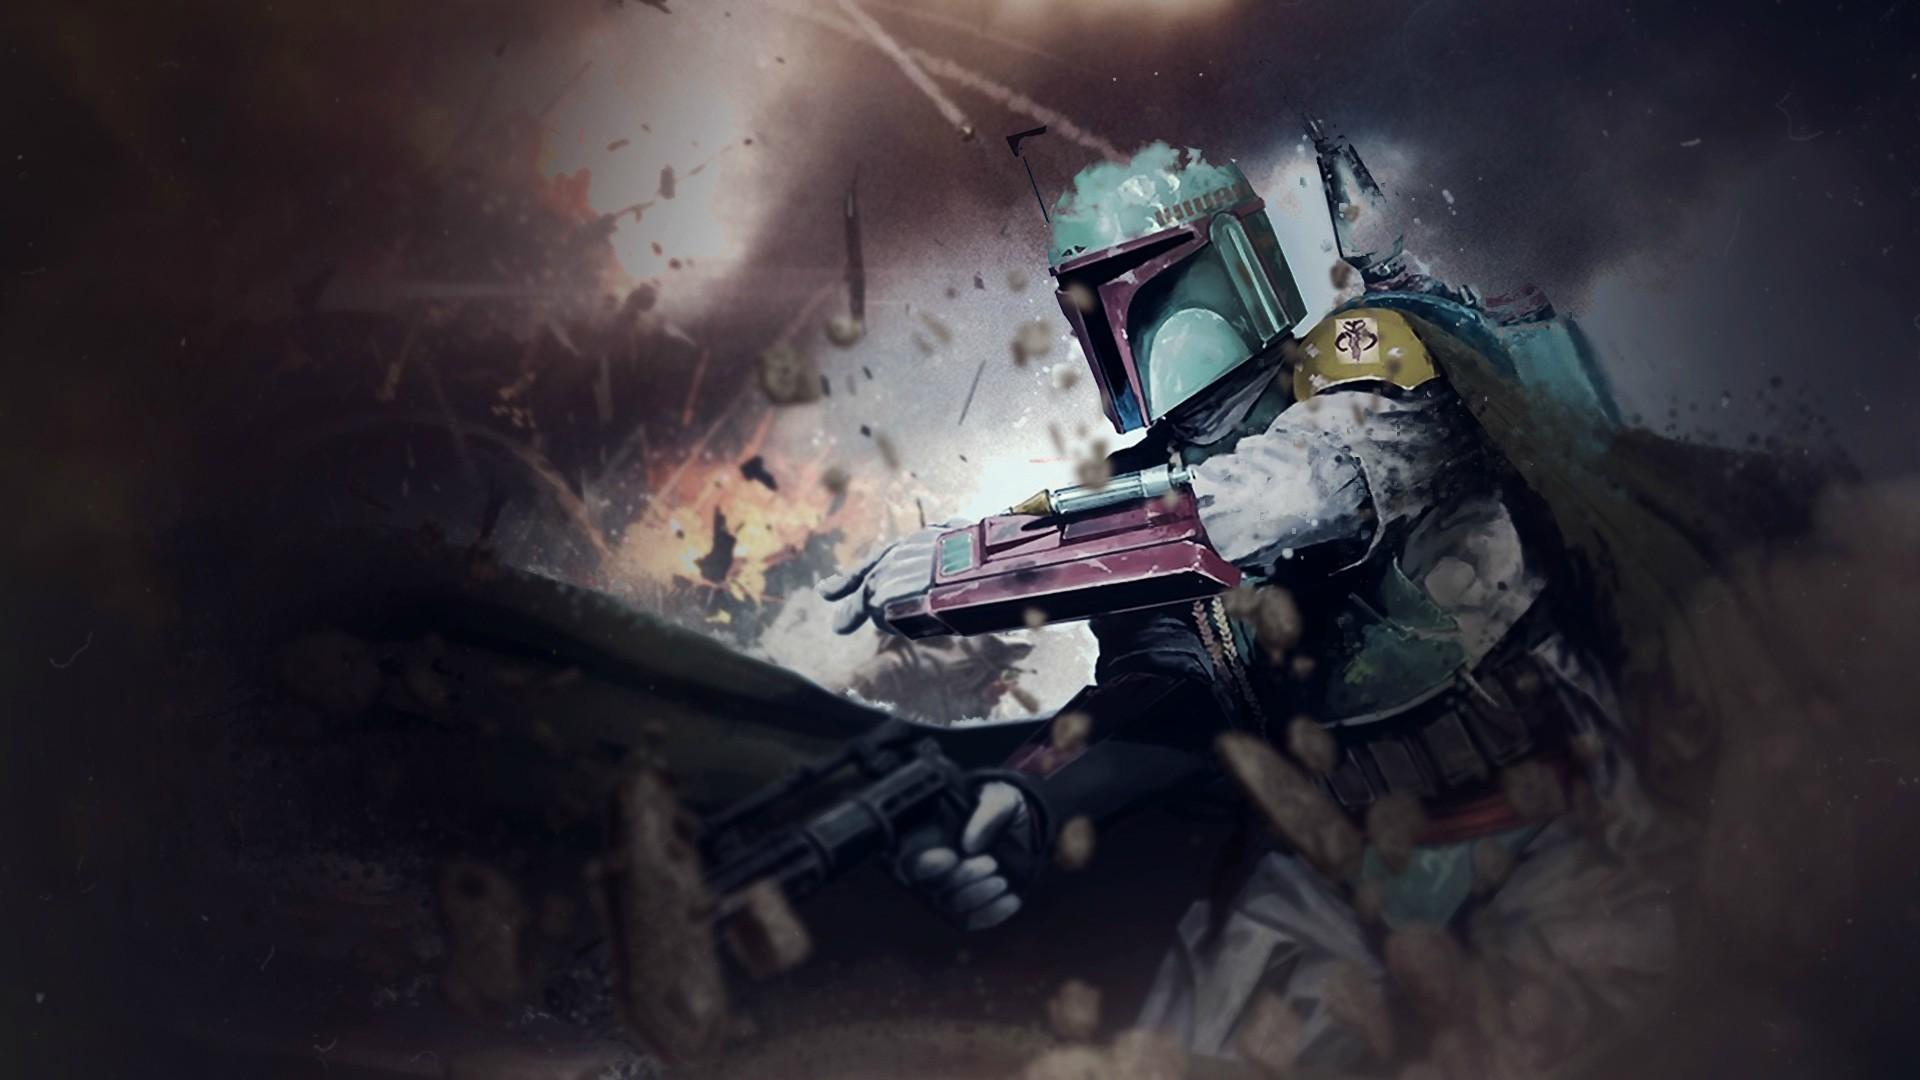 Star Wars Scout Trooper Wallpaper (64+ images)